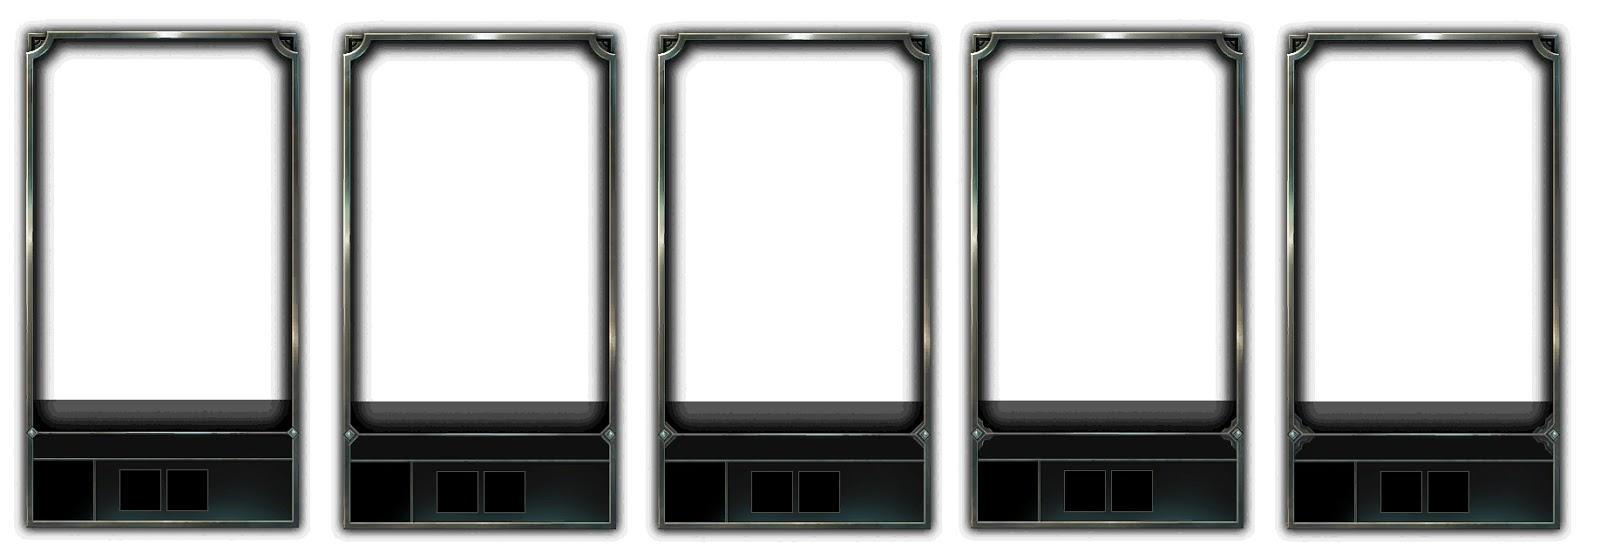 2015 Challenger >> Surrender at 20: 11/2 PBE Update: 2015 Ranked Reward Loading Screen Borders & Summoner icons ...